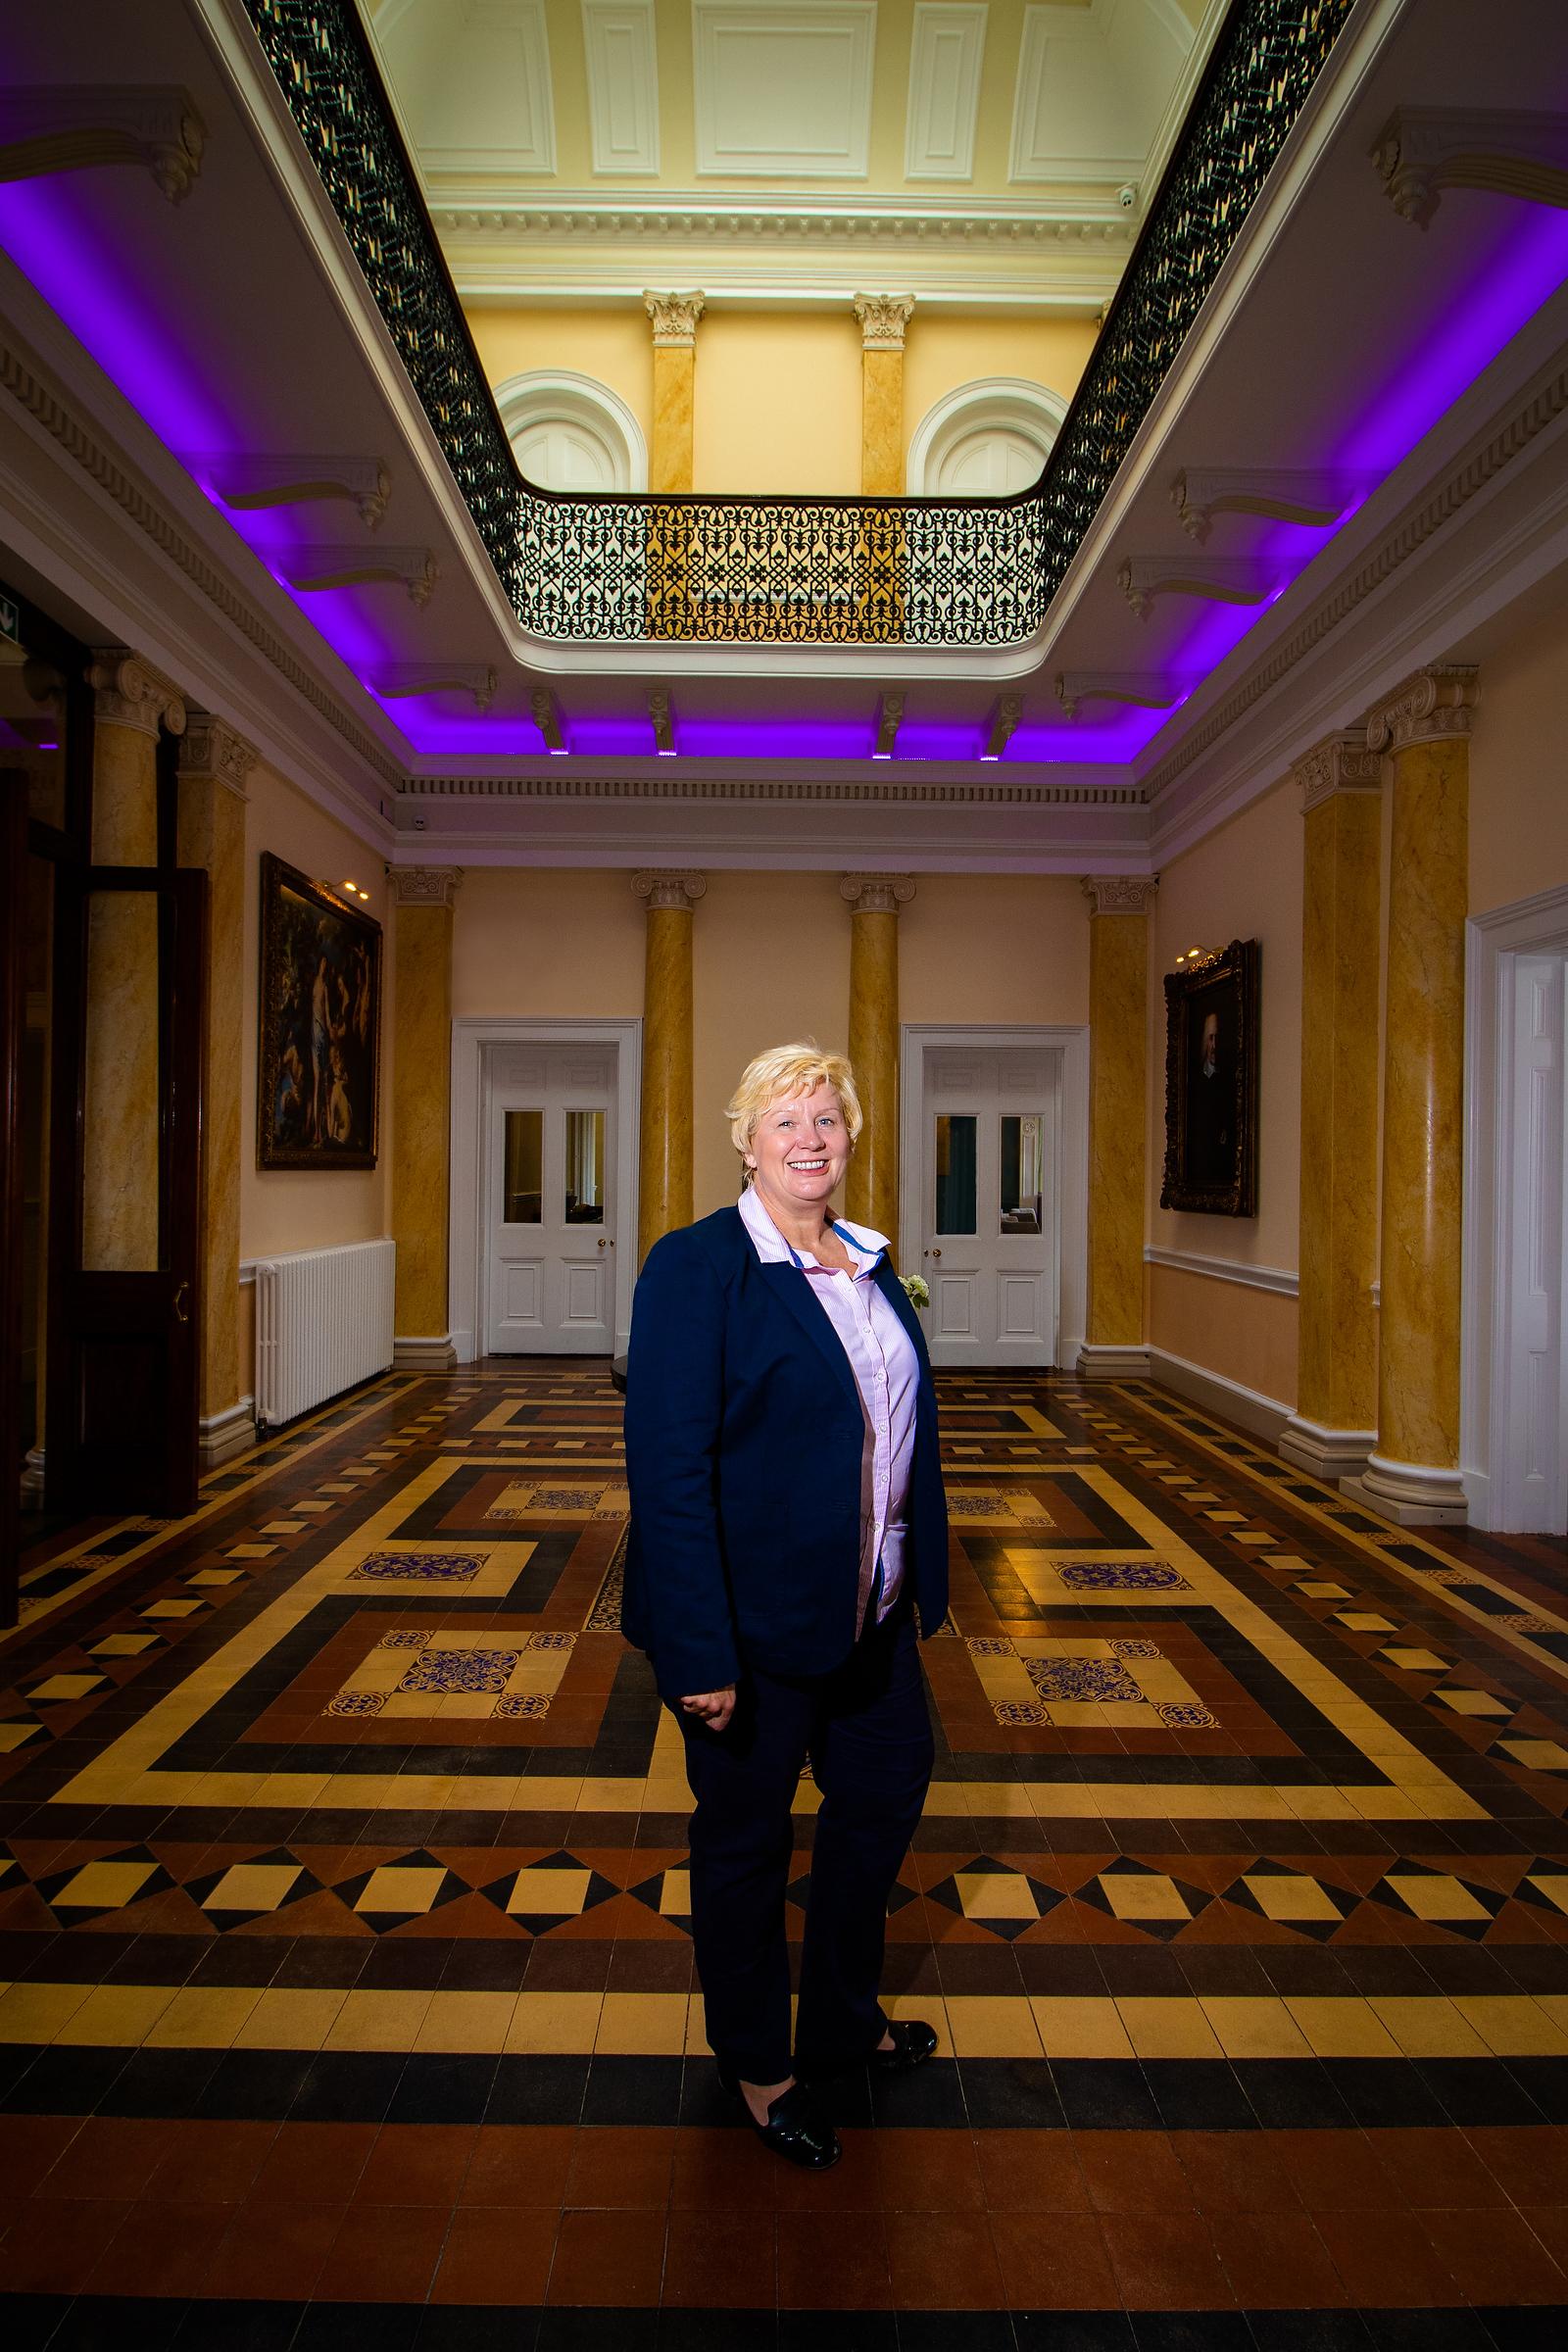 Penny Streeter, Managing Director of Leonardslee Gardens.